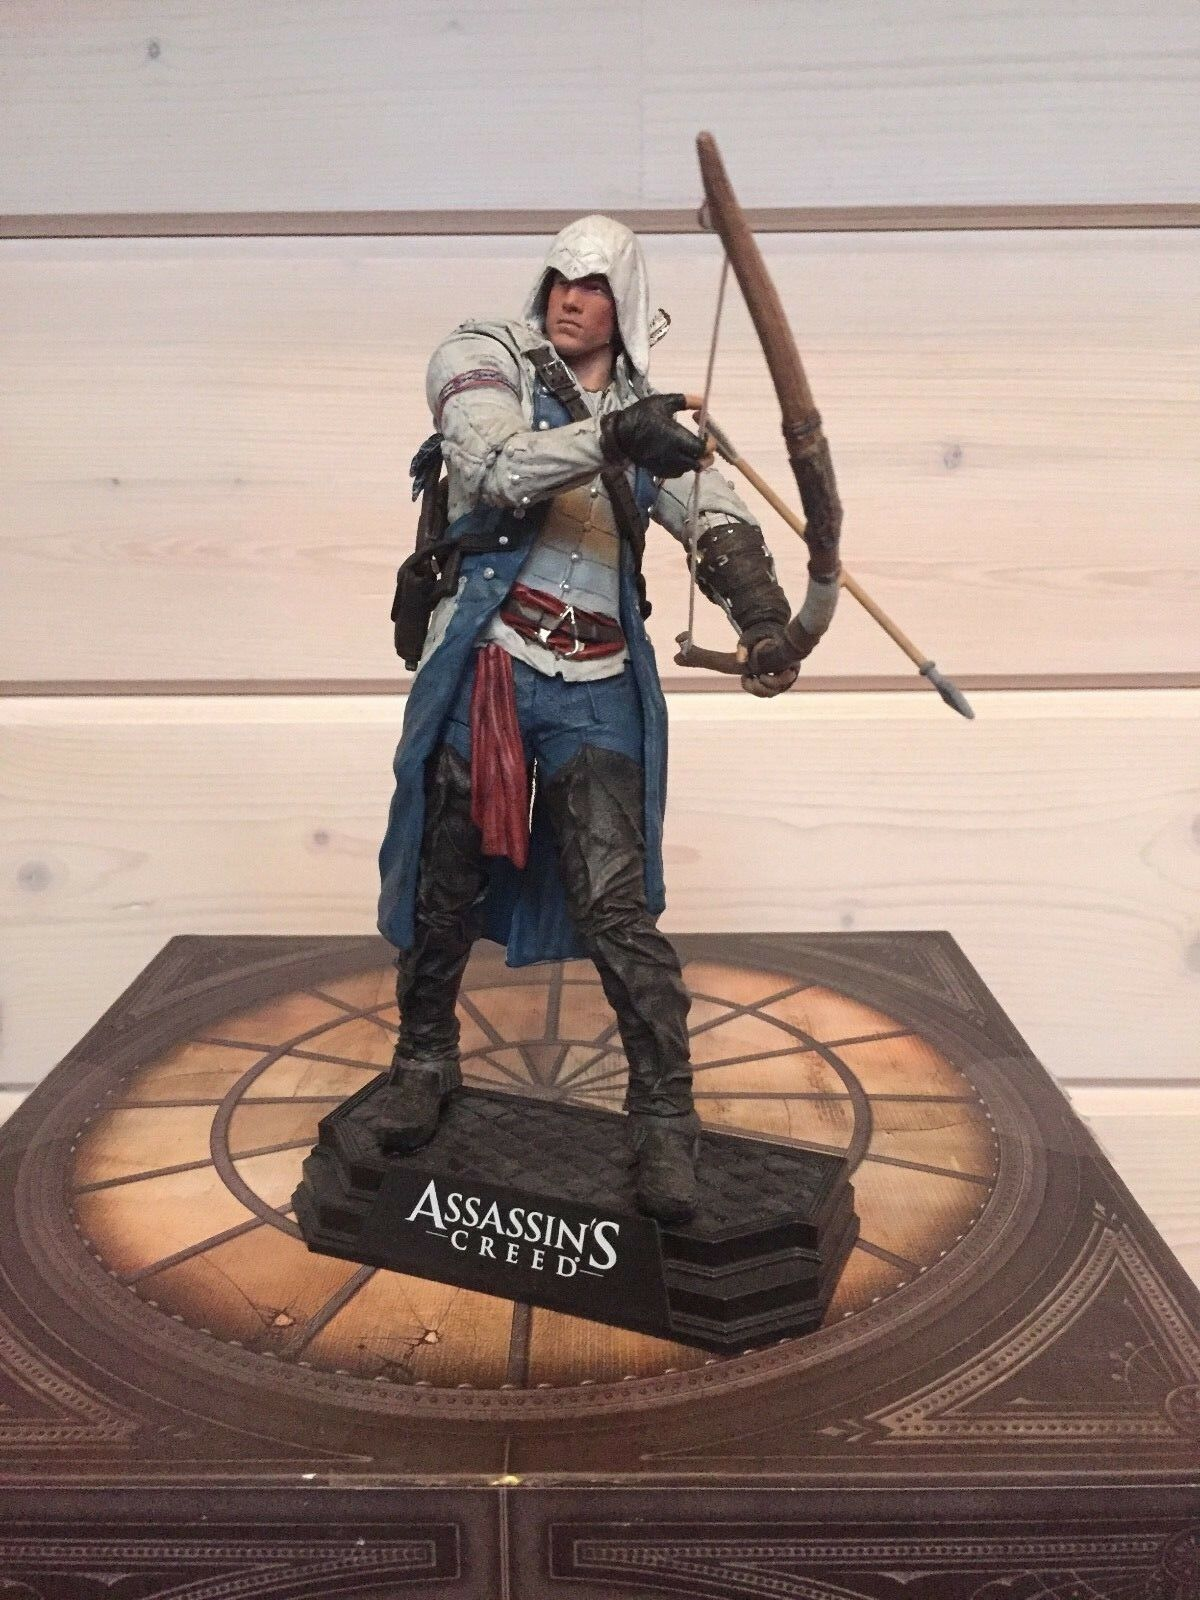 Mcfarlane spielzeug assassin 's creed connor 7  - statue finden